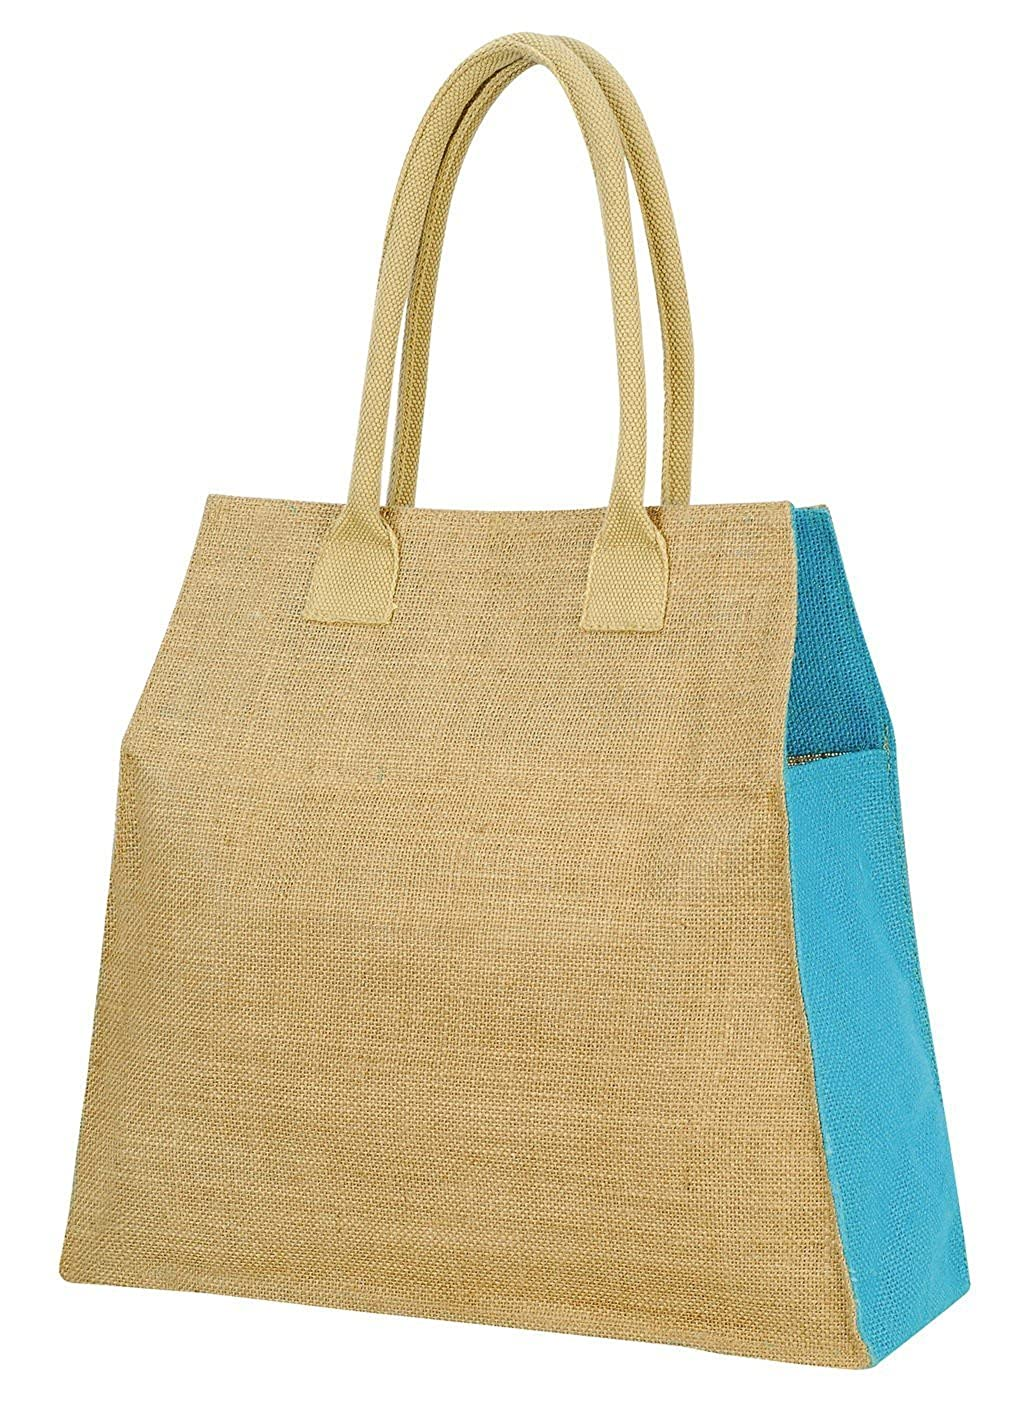 Shugon Womens Leisure Jute Bag